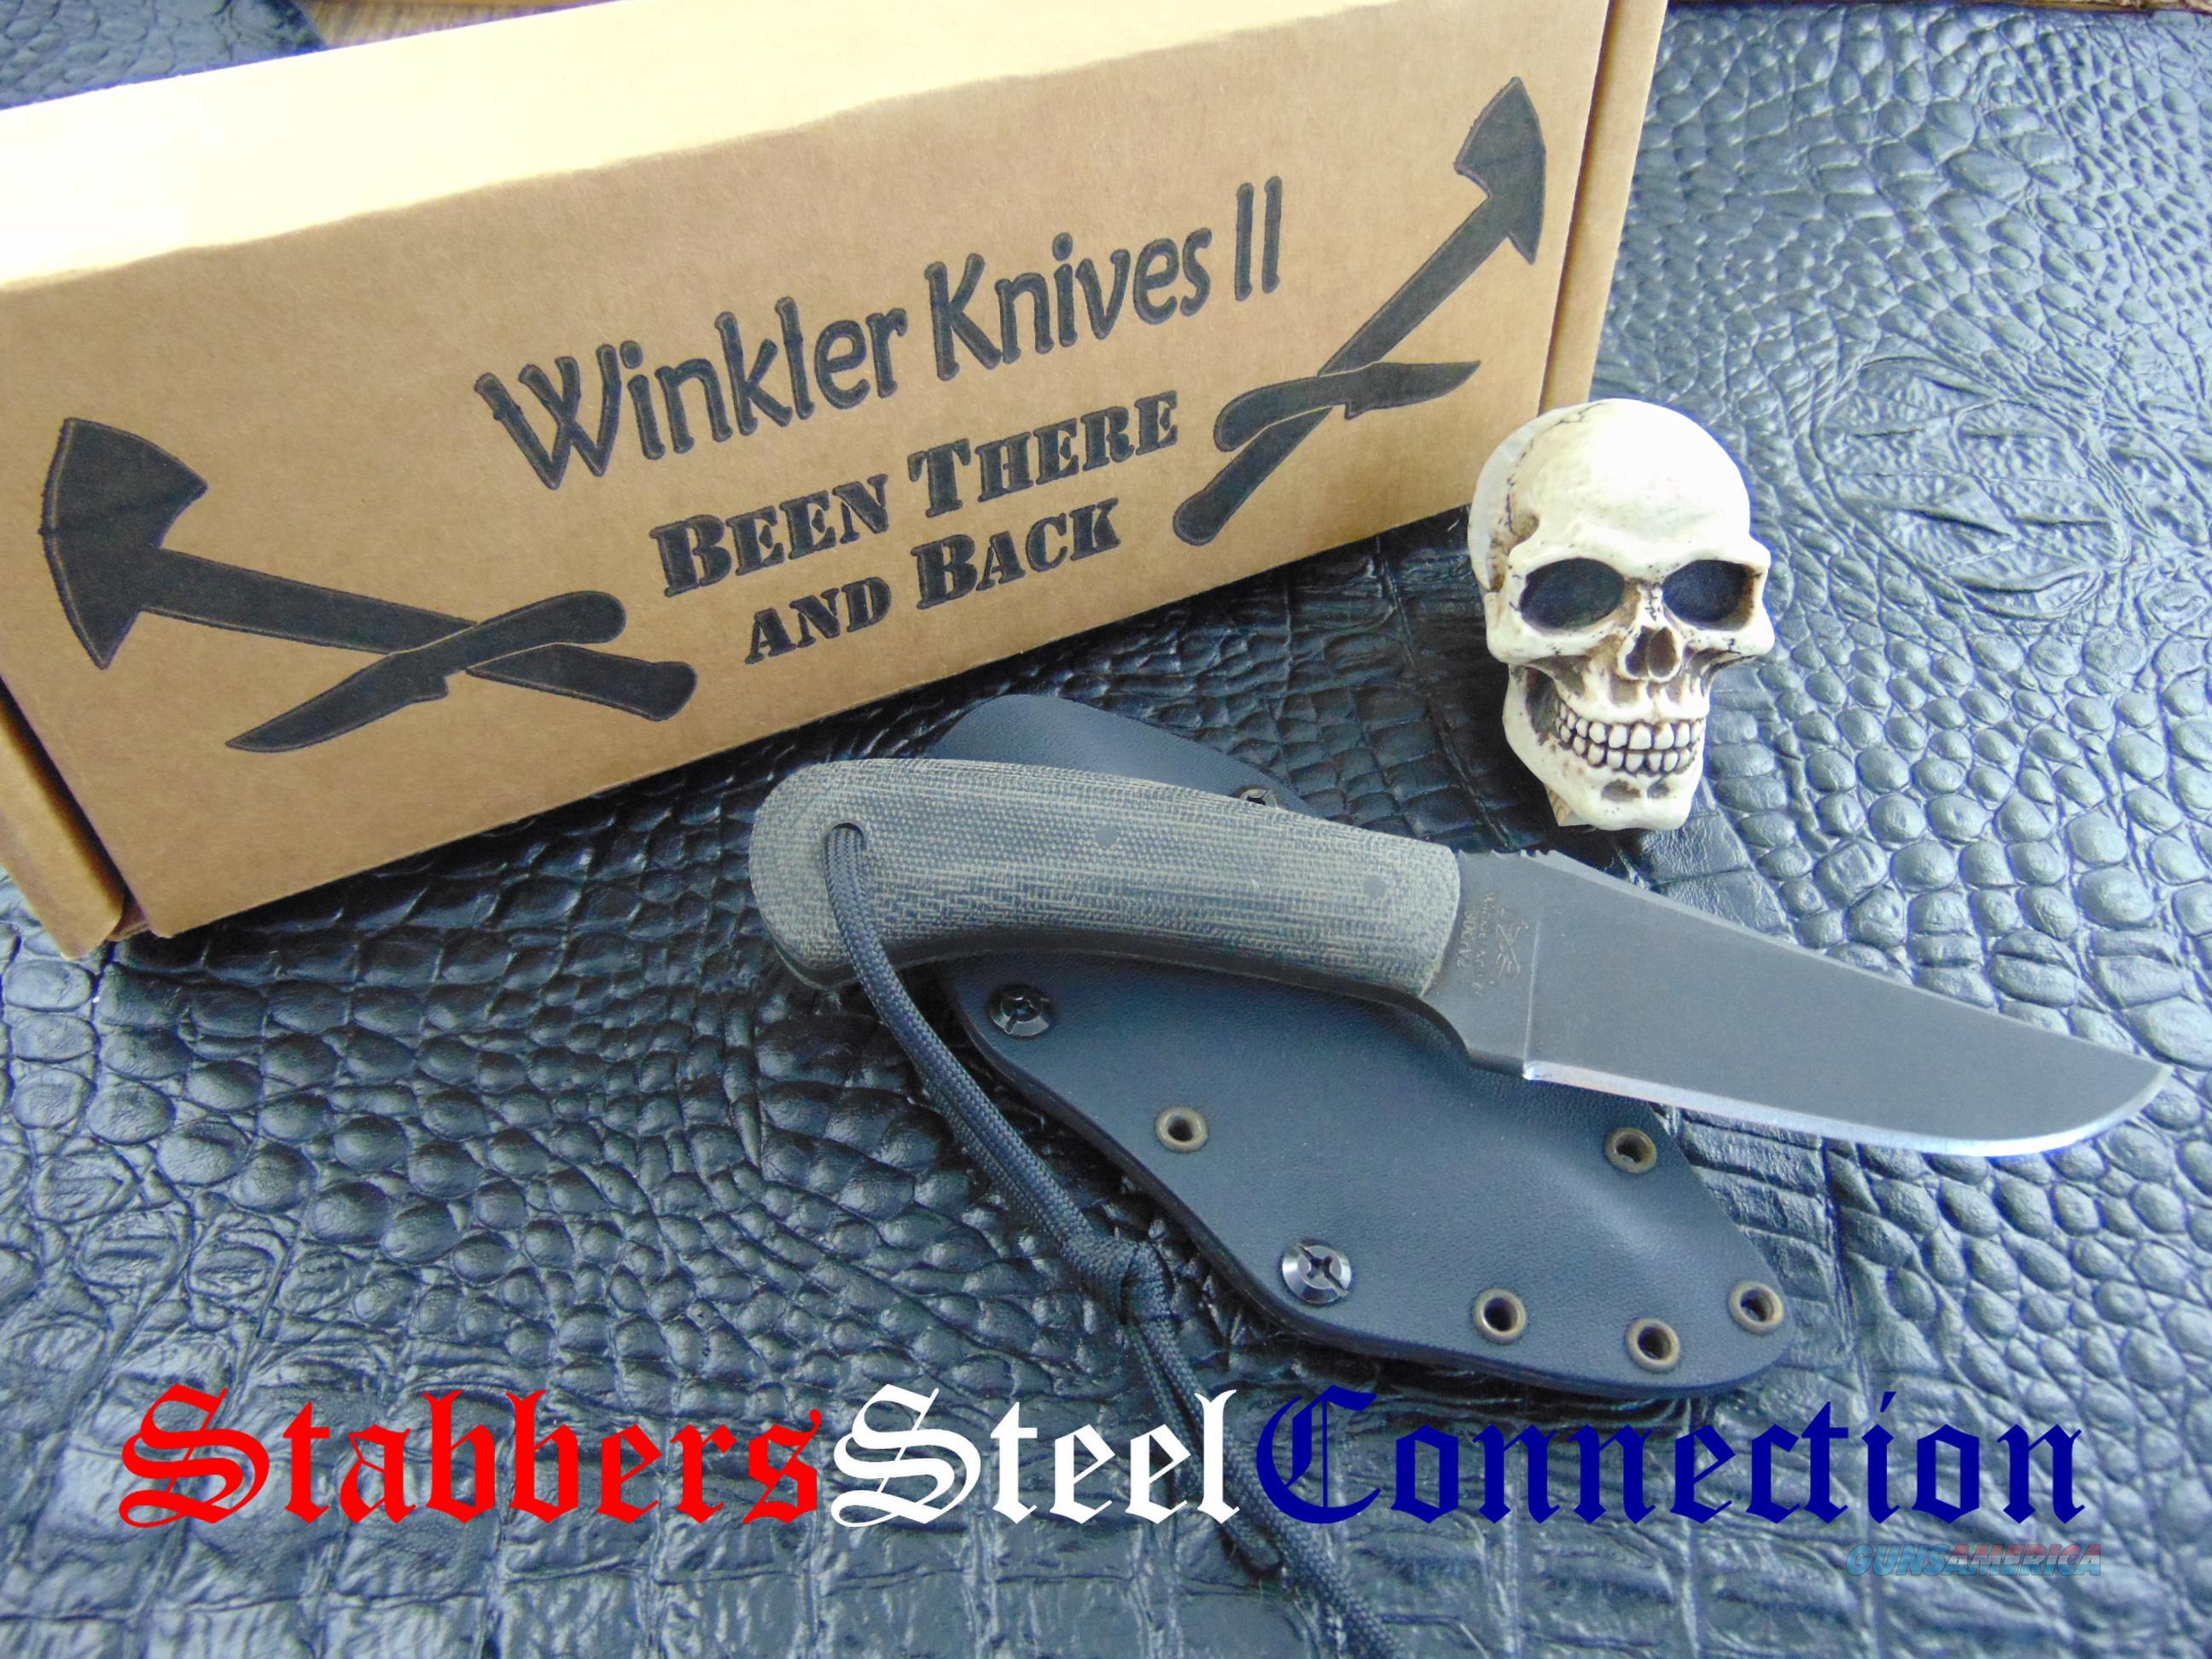 Dan Winkler MS ABS Master Smith Micarta Blue Ridge Hunter Model  Non-Guns > Knives/Swords > Knives > Folding Blade > Hand Made